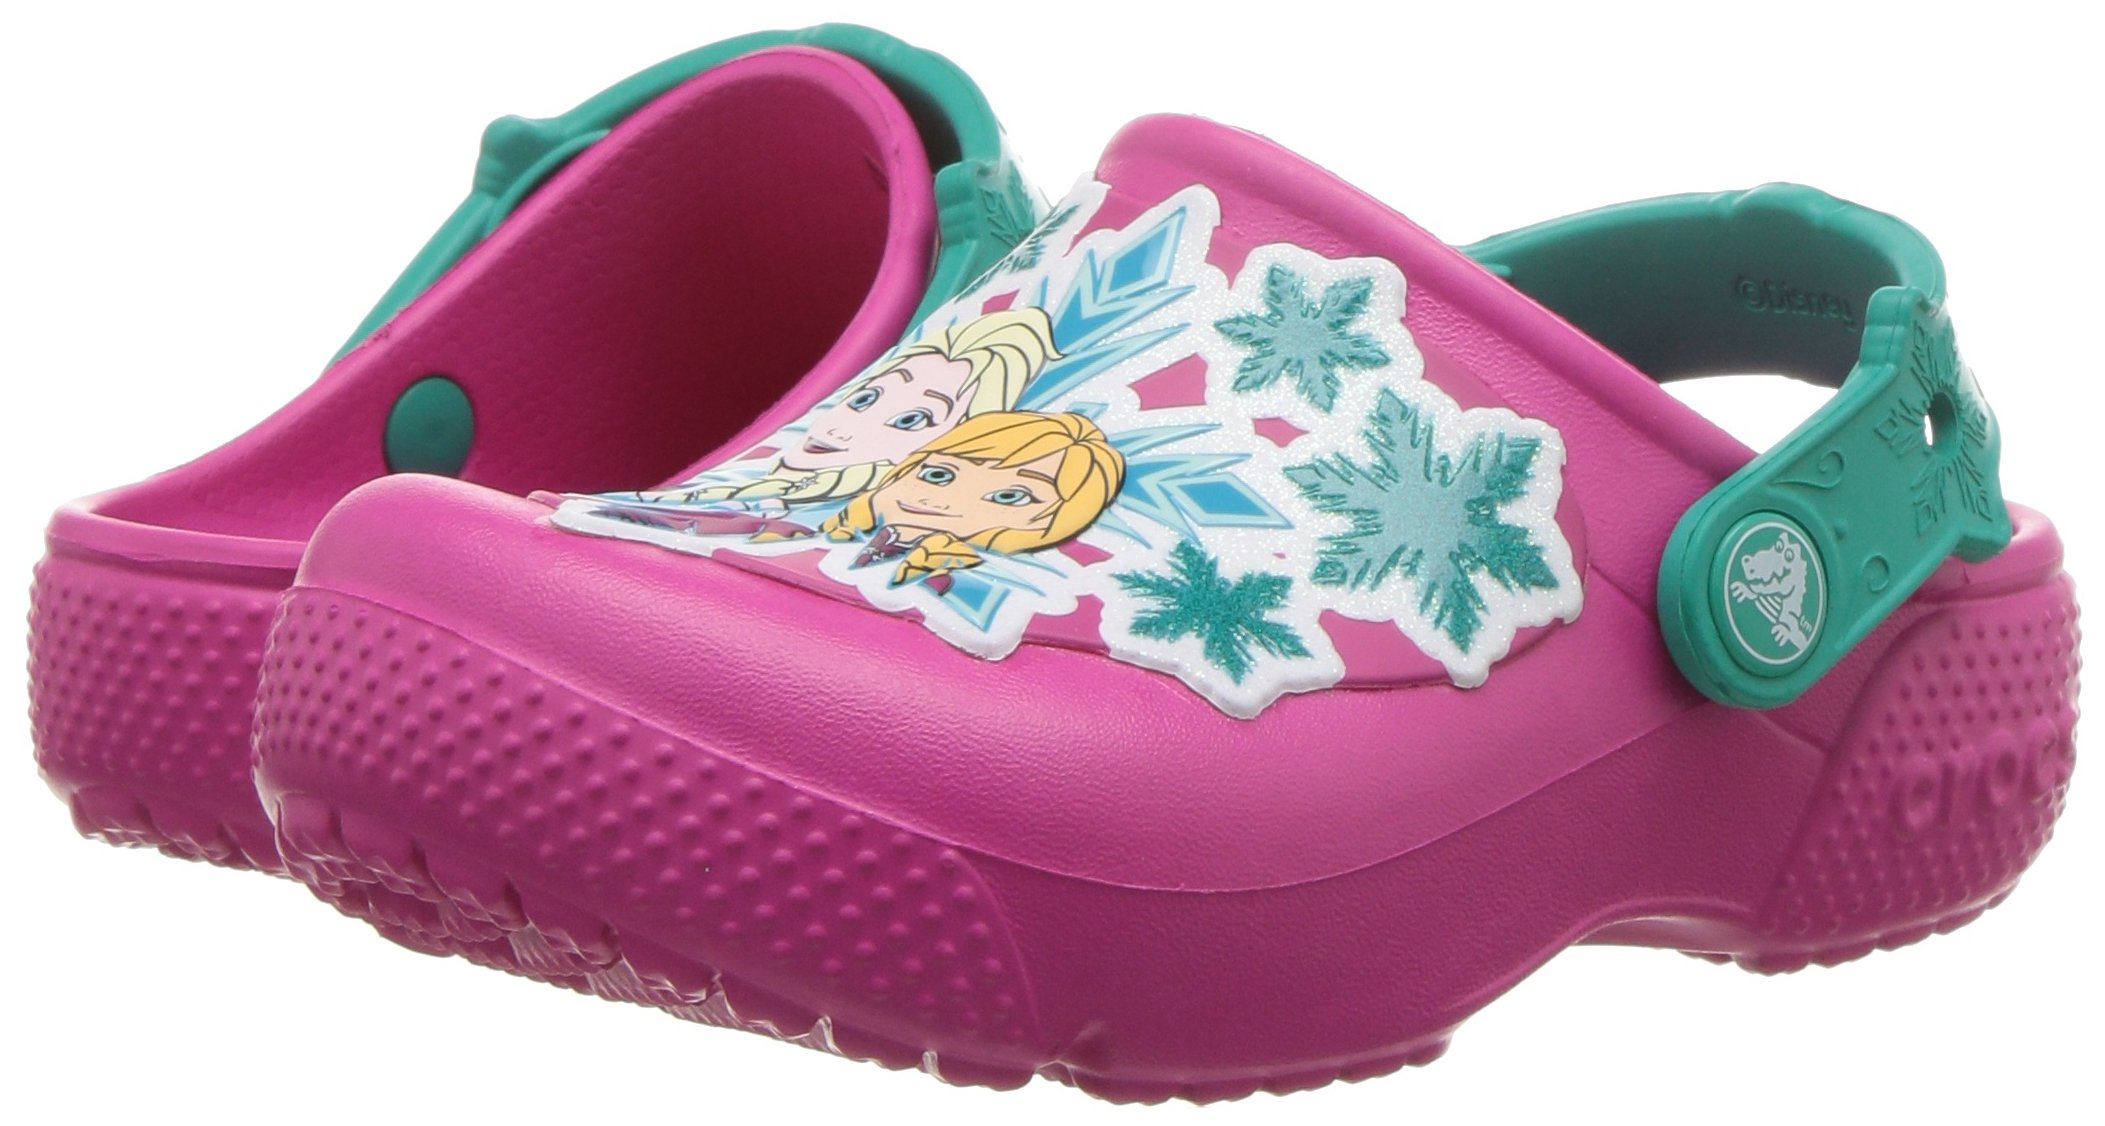 Crocs Girls' Fun Lab Frozen Clog K, Candy Pink, 10 M US Little Kid by Crocs (Image #6)